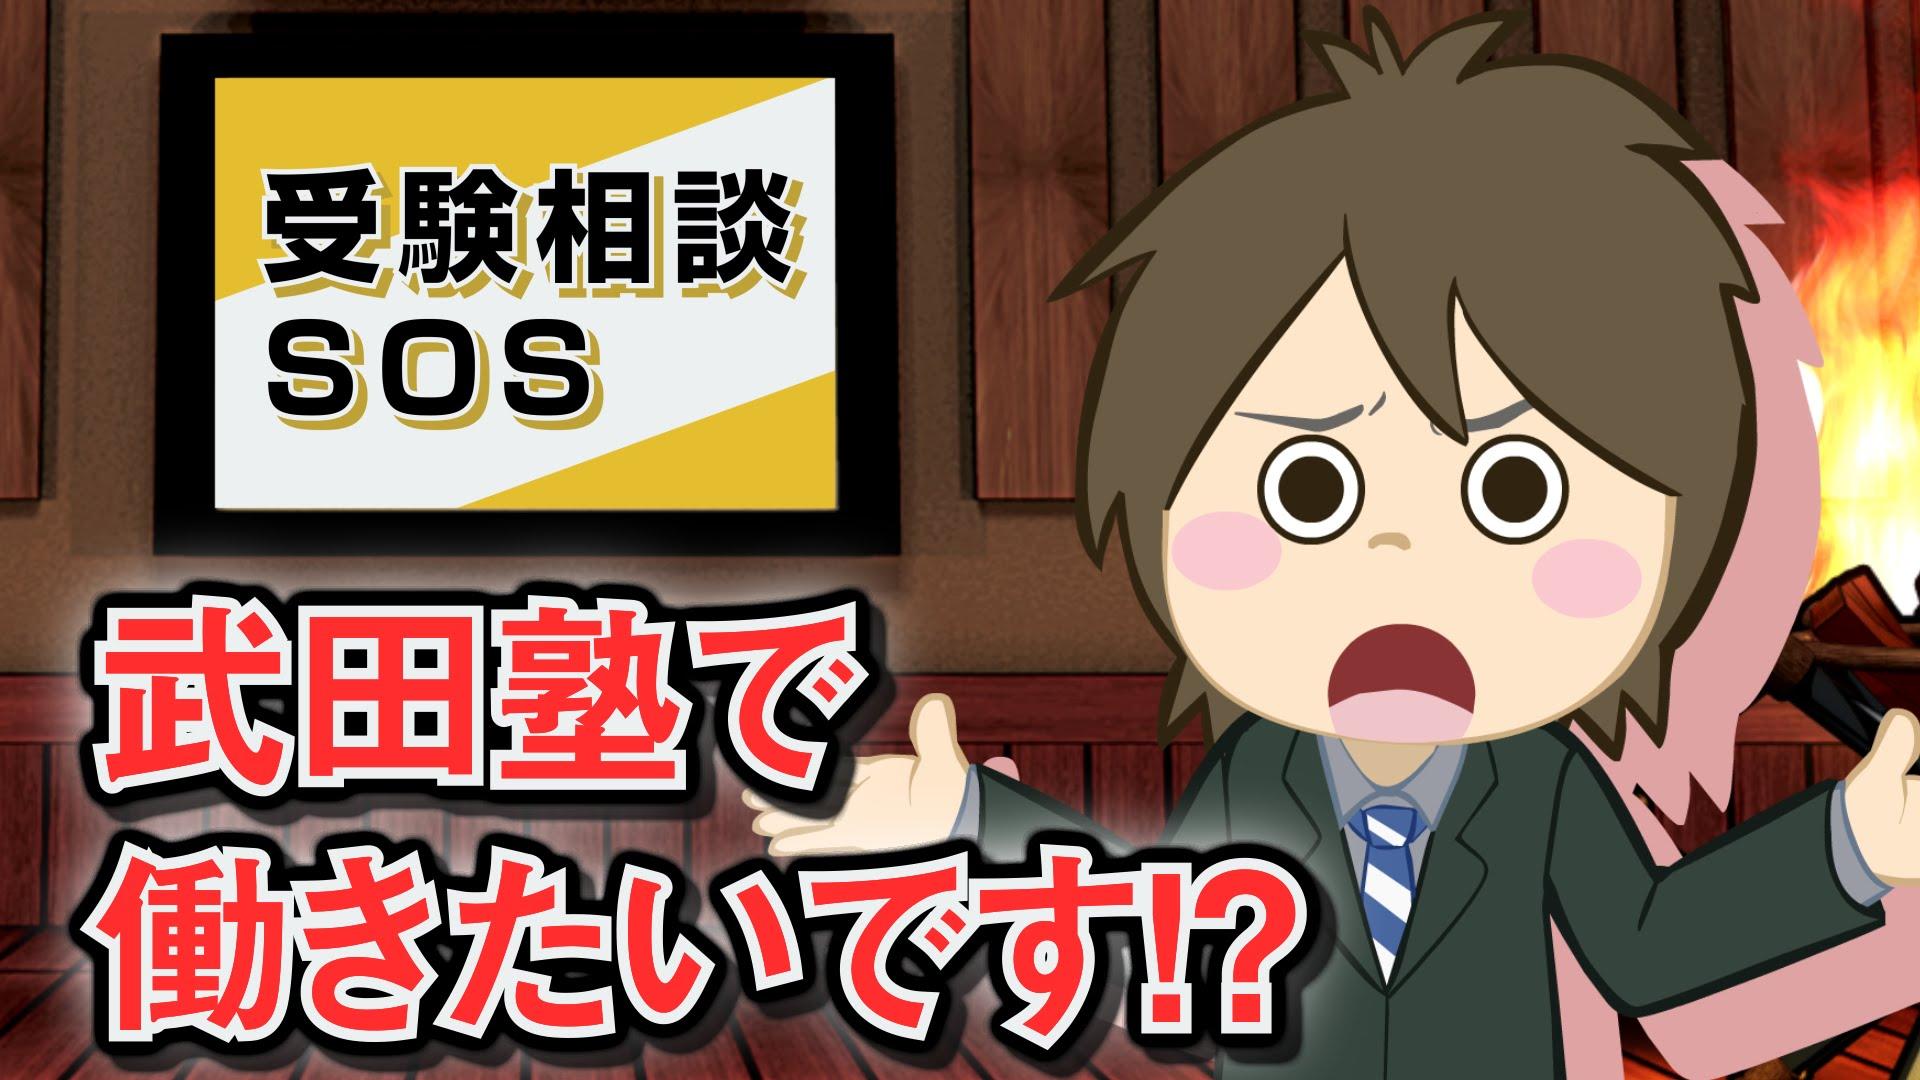 【vol.67】武田塾で働く方法!?|受験相談SOS